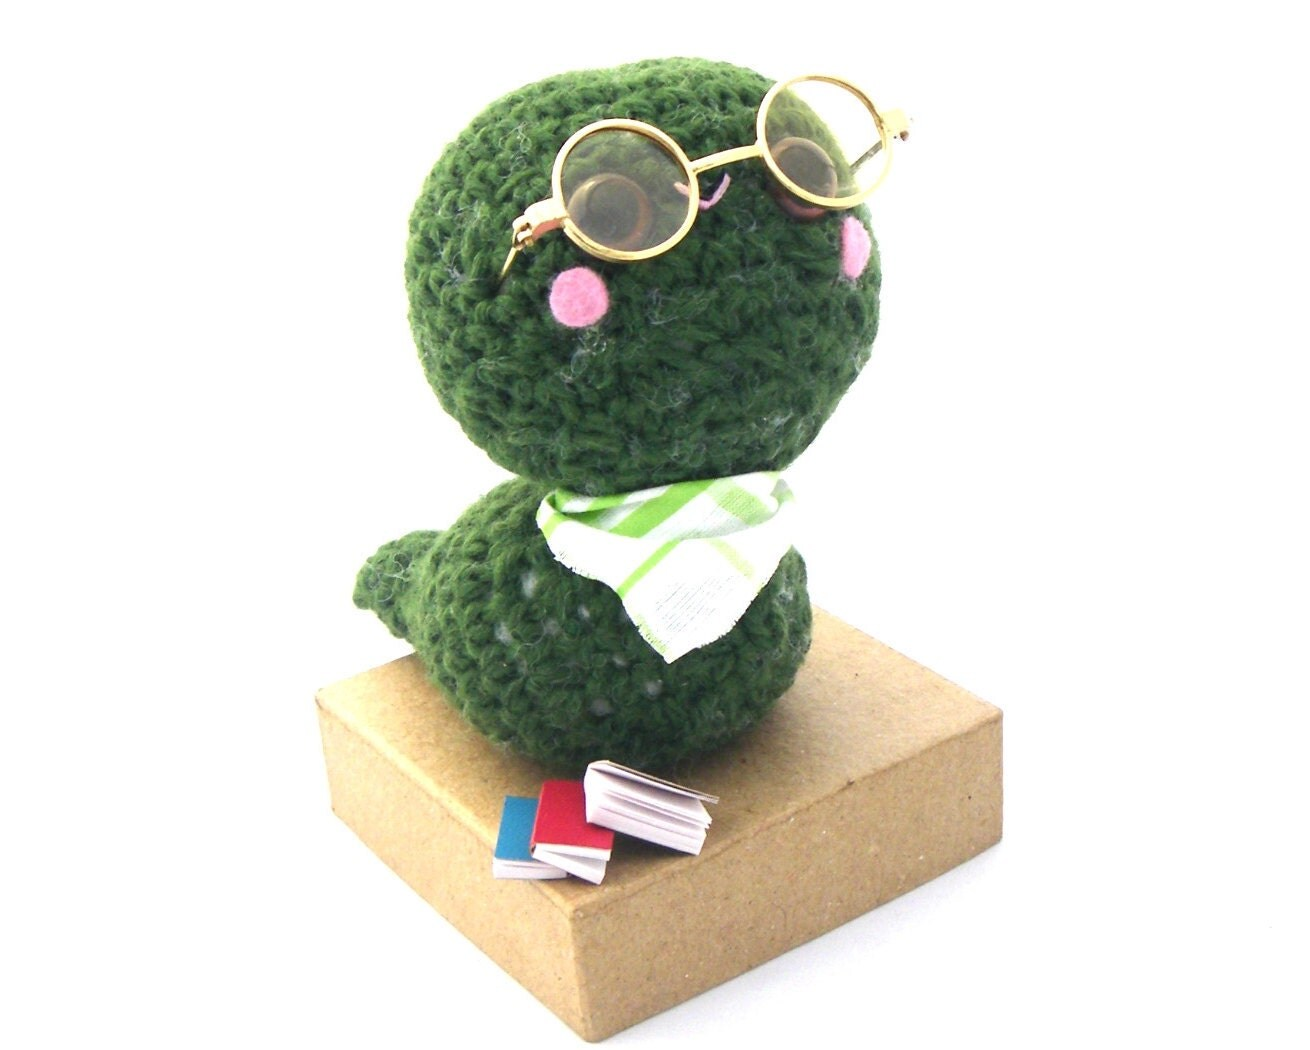 Amigurumi Glasses : bookworm amigurumi plush stuffed animal glasses by ...